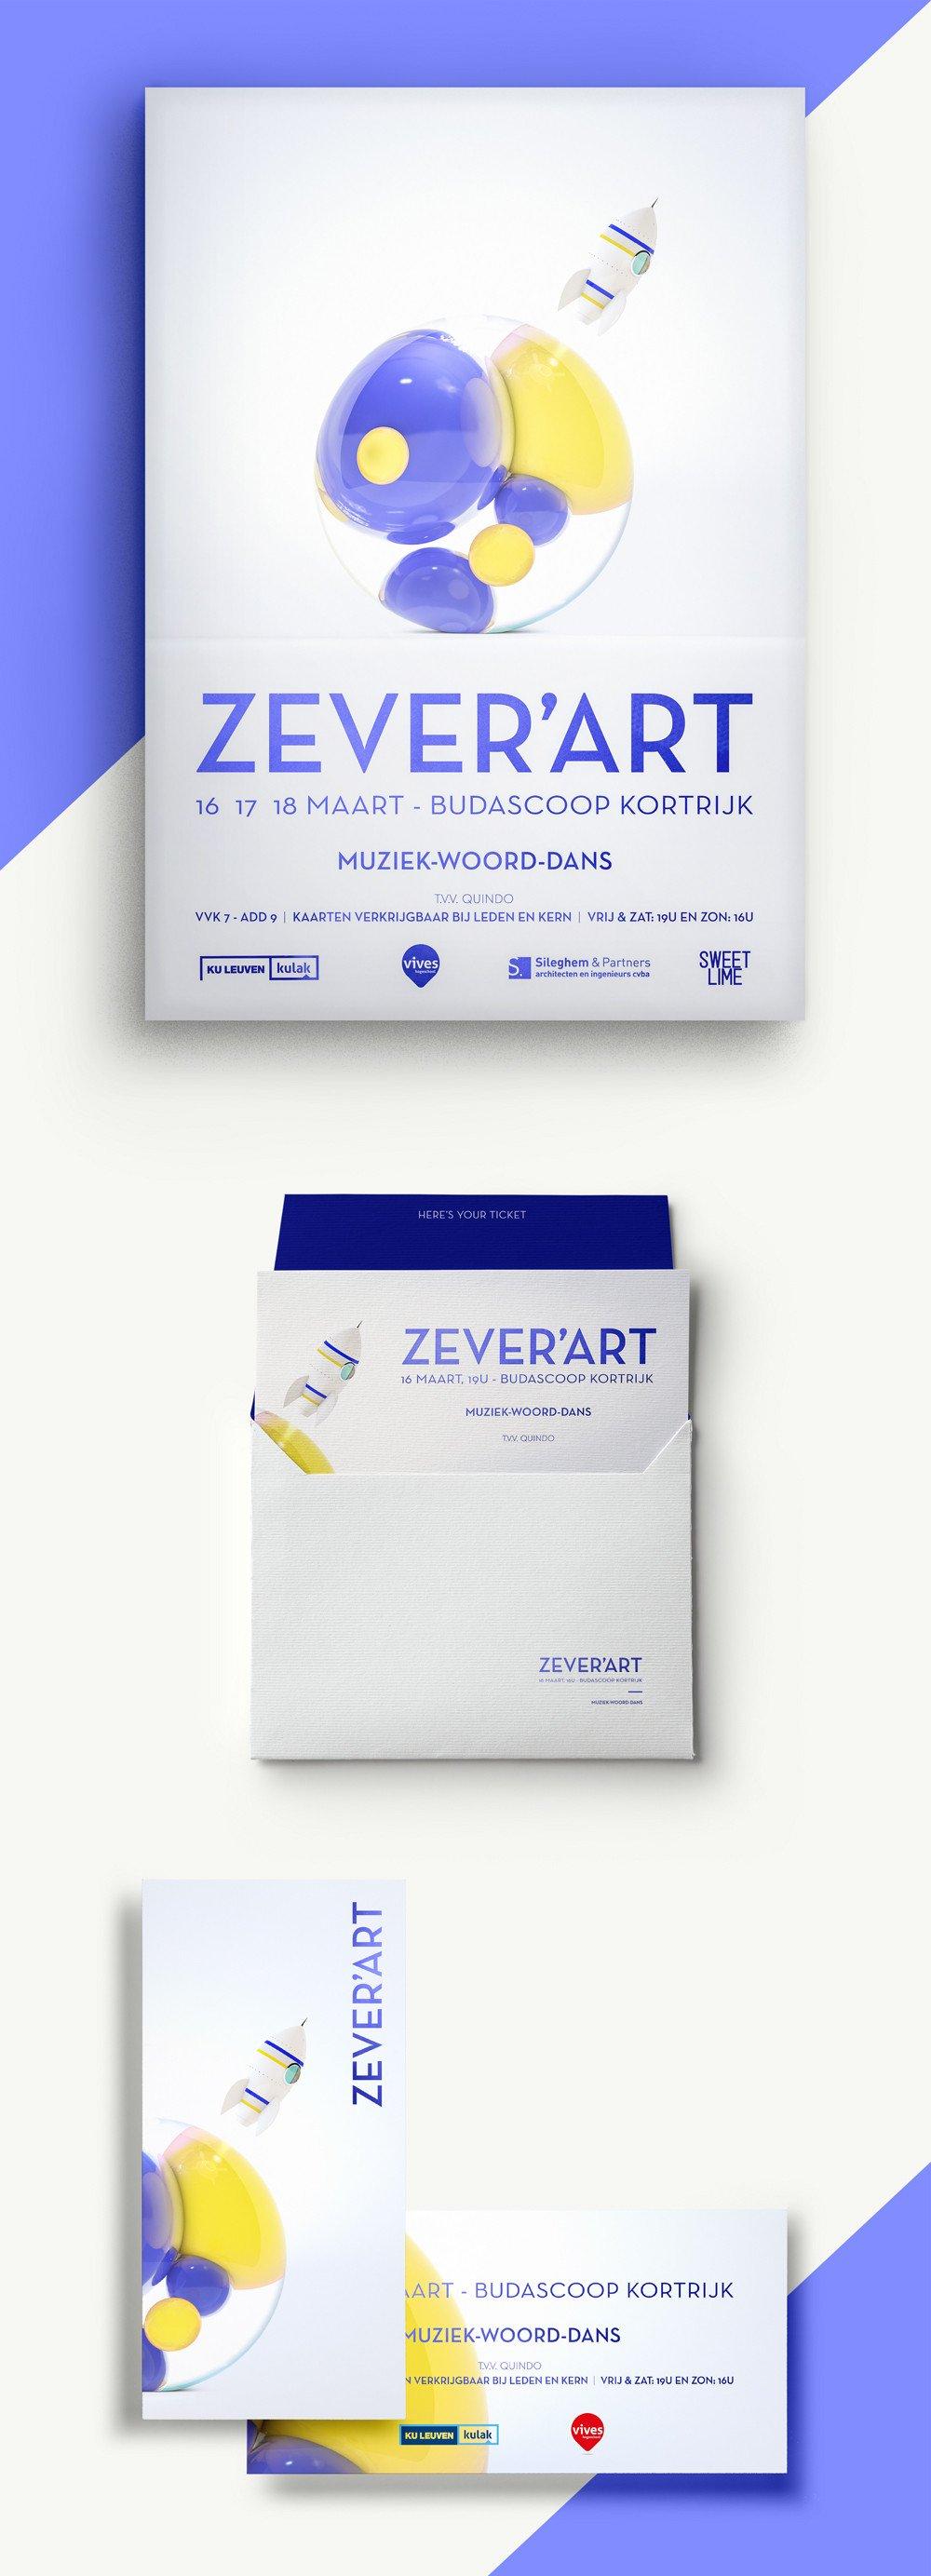 ZEVERART_Poster-Mockup.jpg